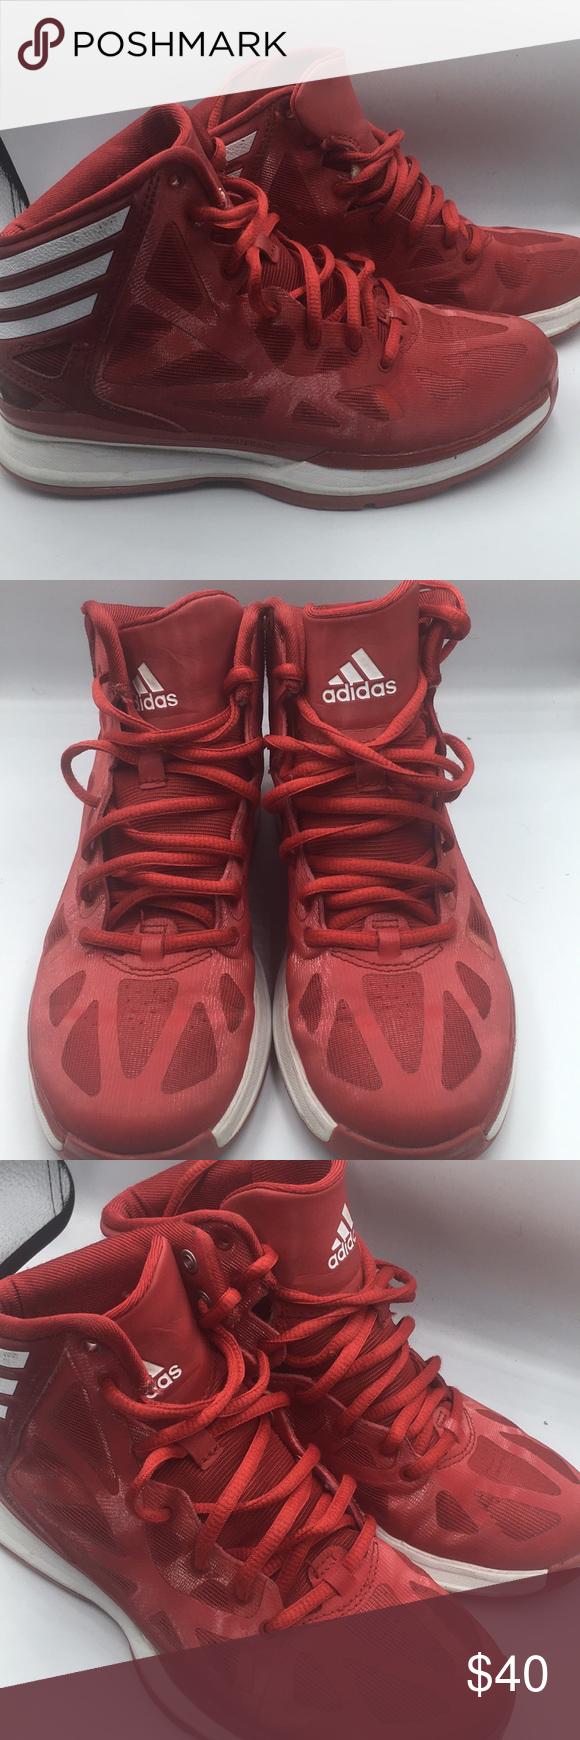 Cantidad de Componer Perezoso  Adidas Sprintframe Sprint Web Red Basketball Shoes | Red basketball shoes, Basketball  shoes, Shoes sneakers adidas